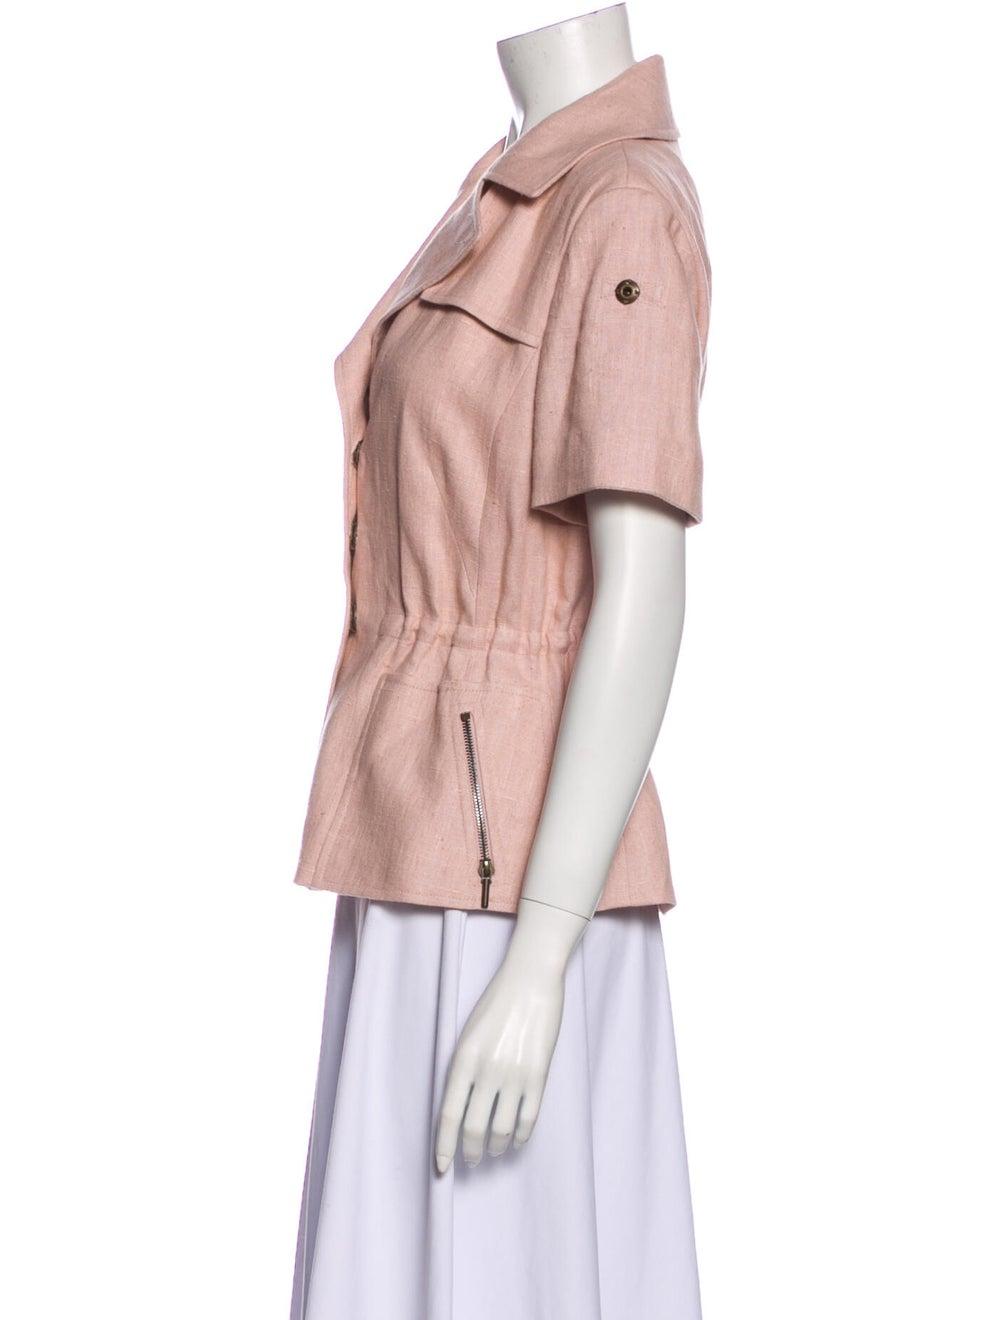 Akris Punto Linen Jacket - image 2